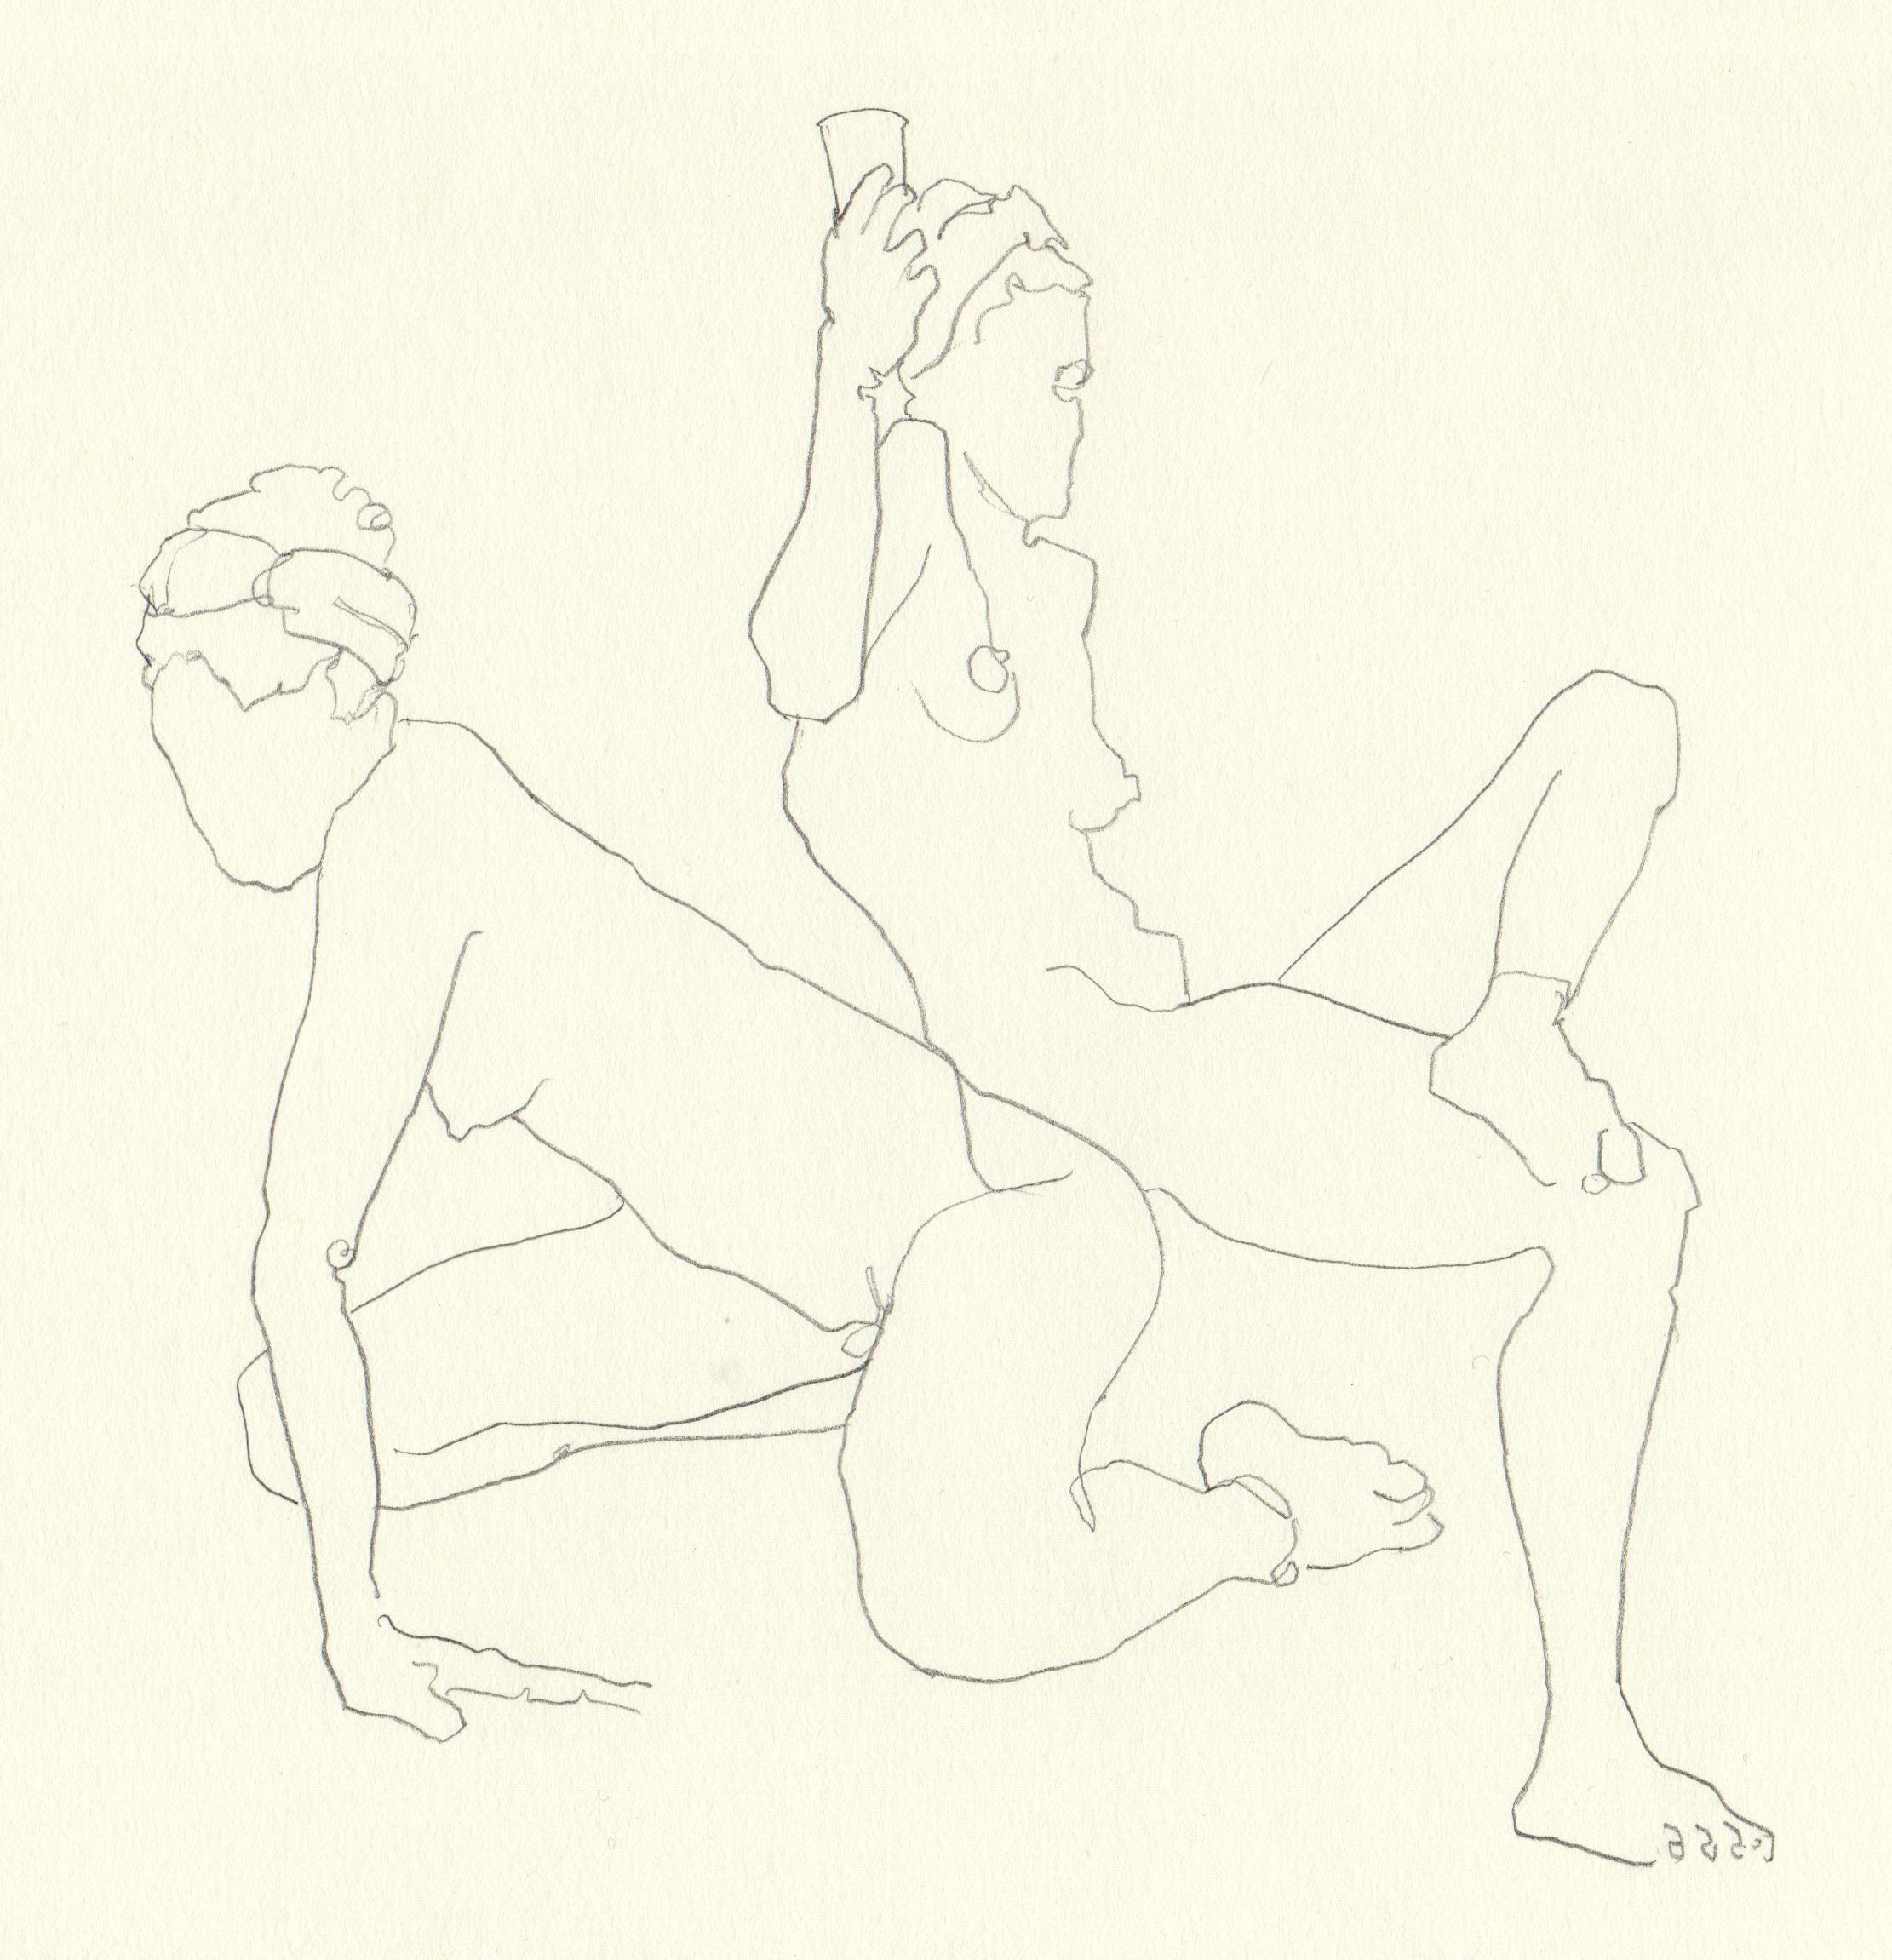 2012_Sketch_F-Beudin_075